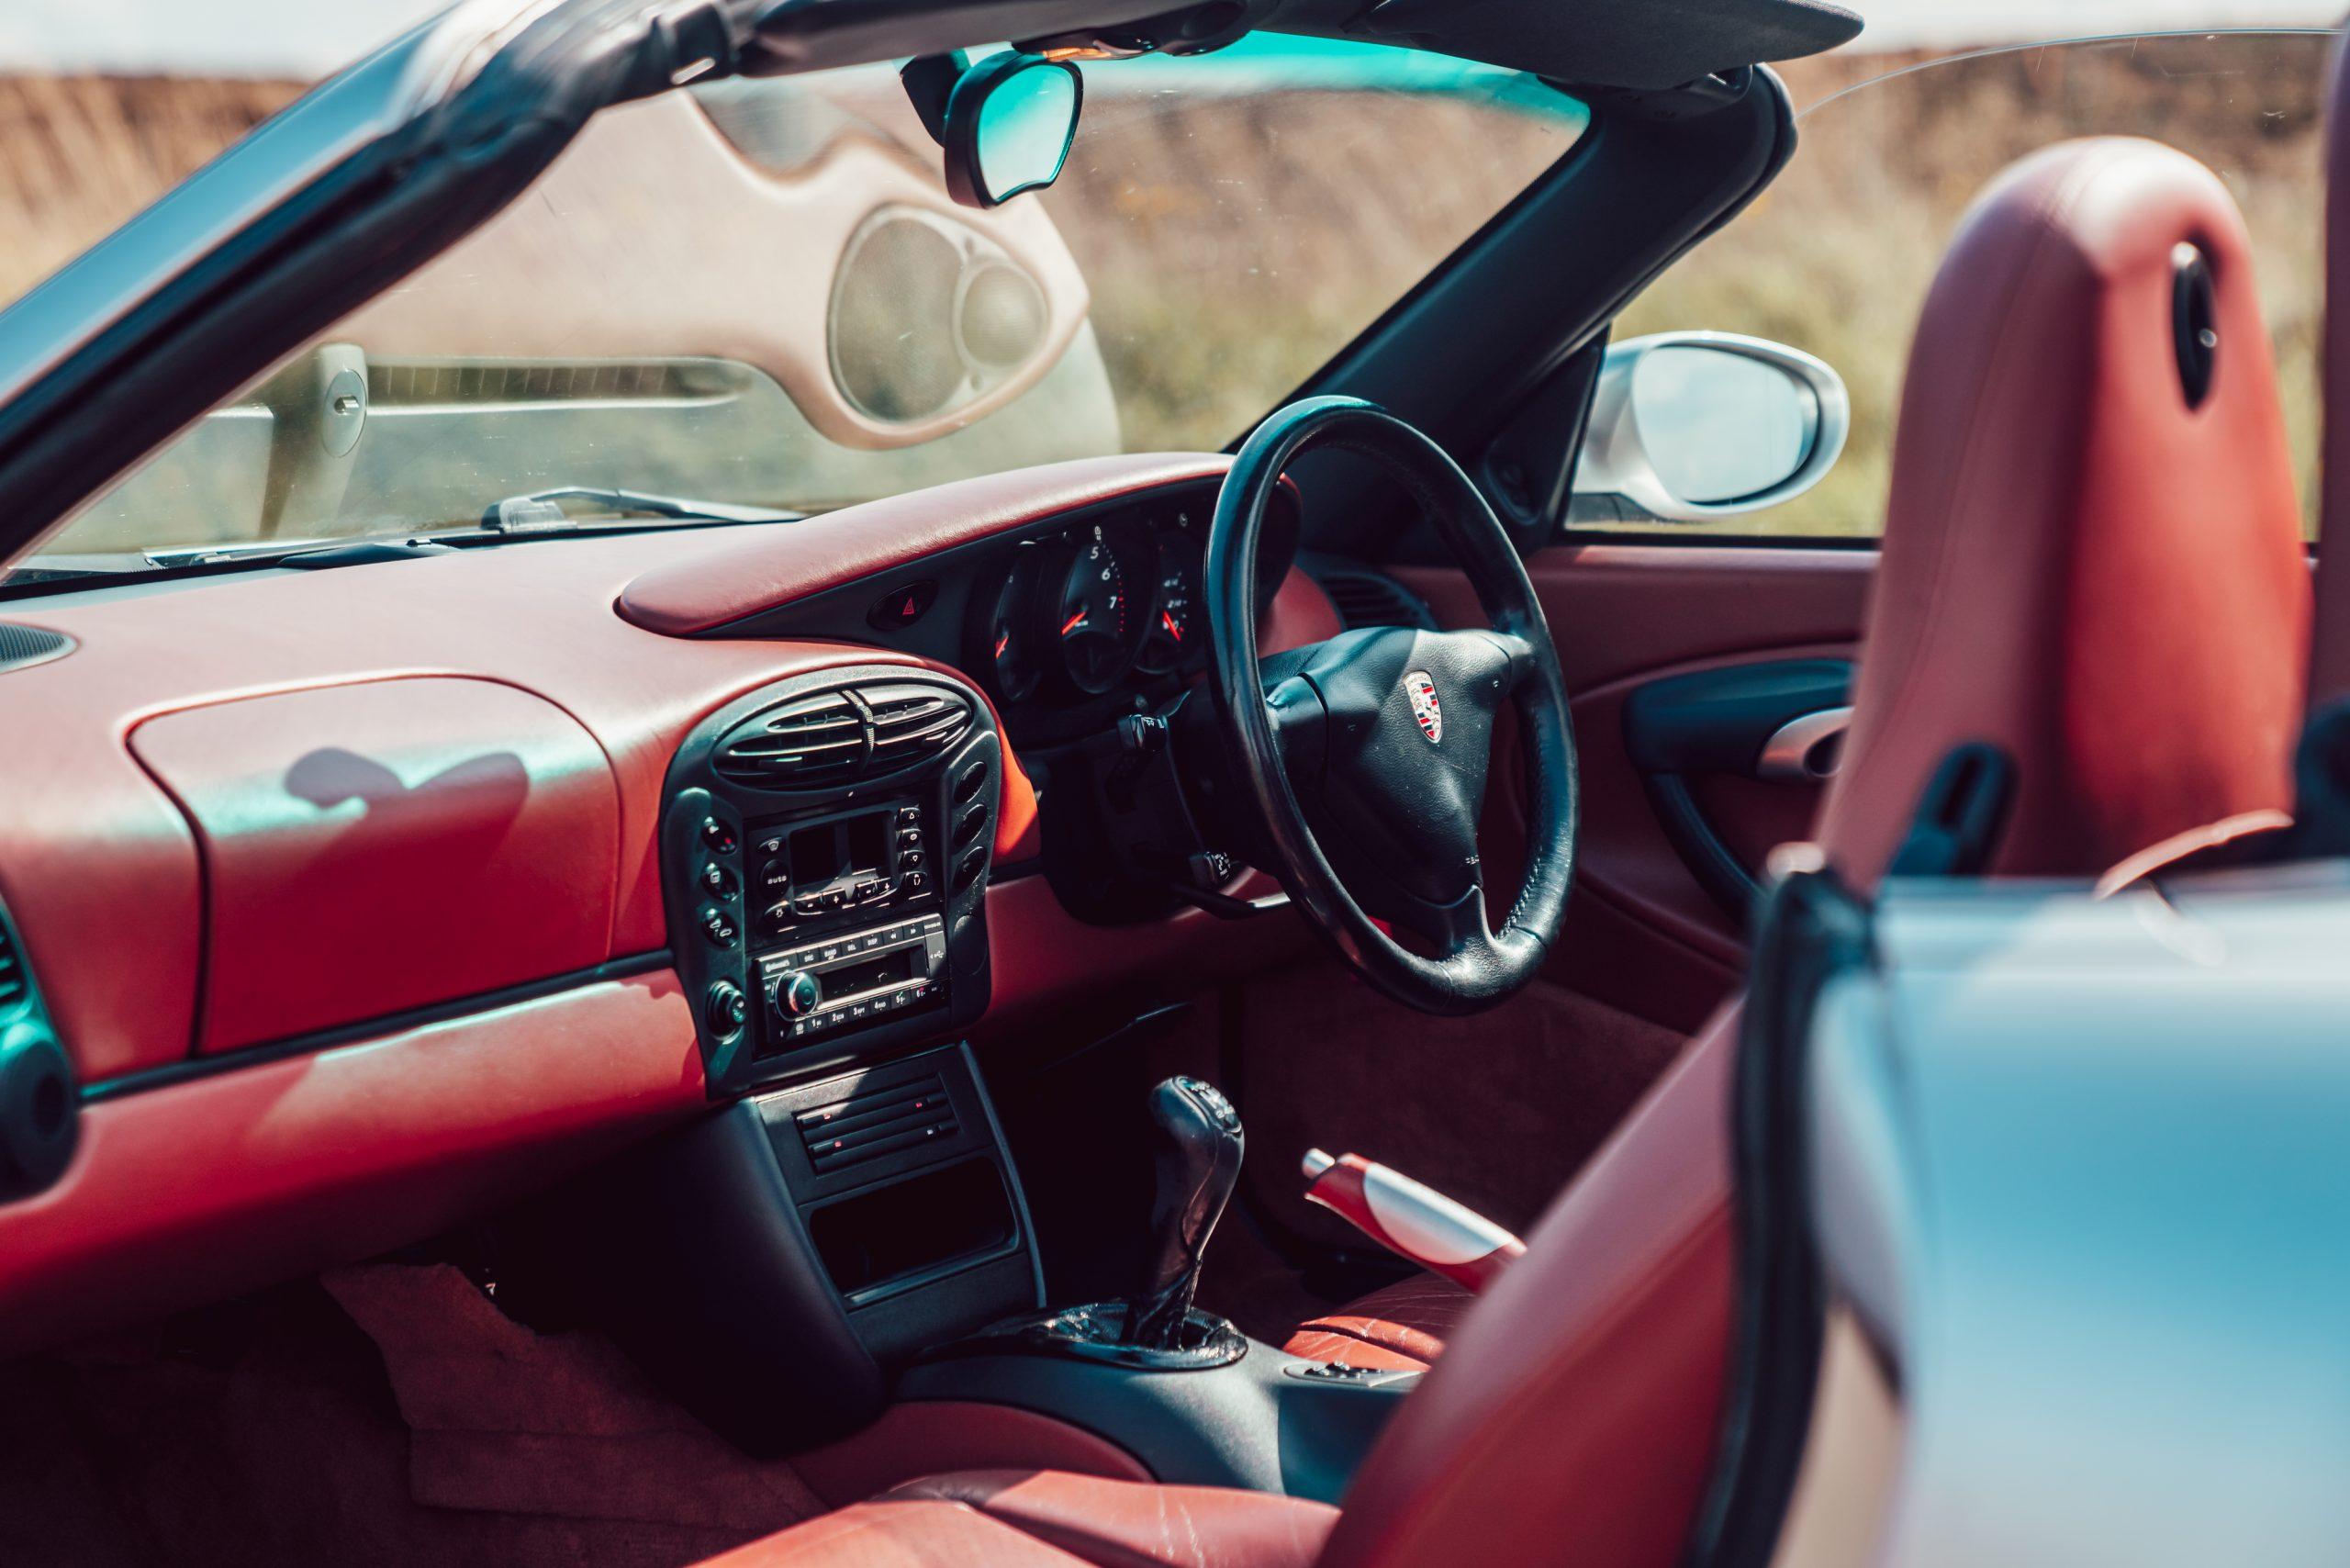 1998 Porsche Boxster 986 interior cockpit angle